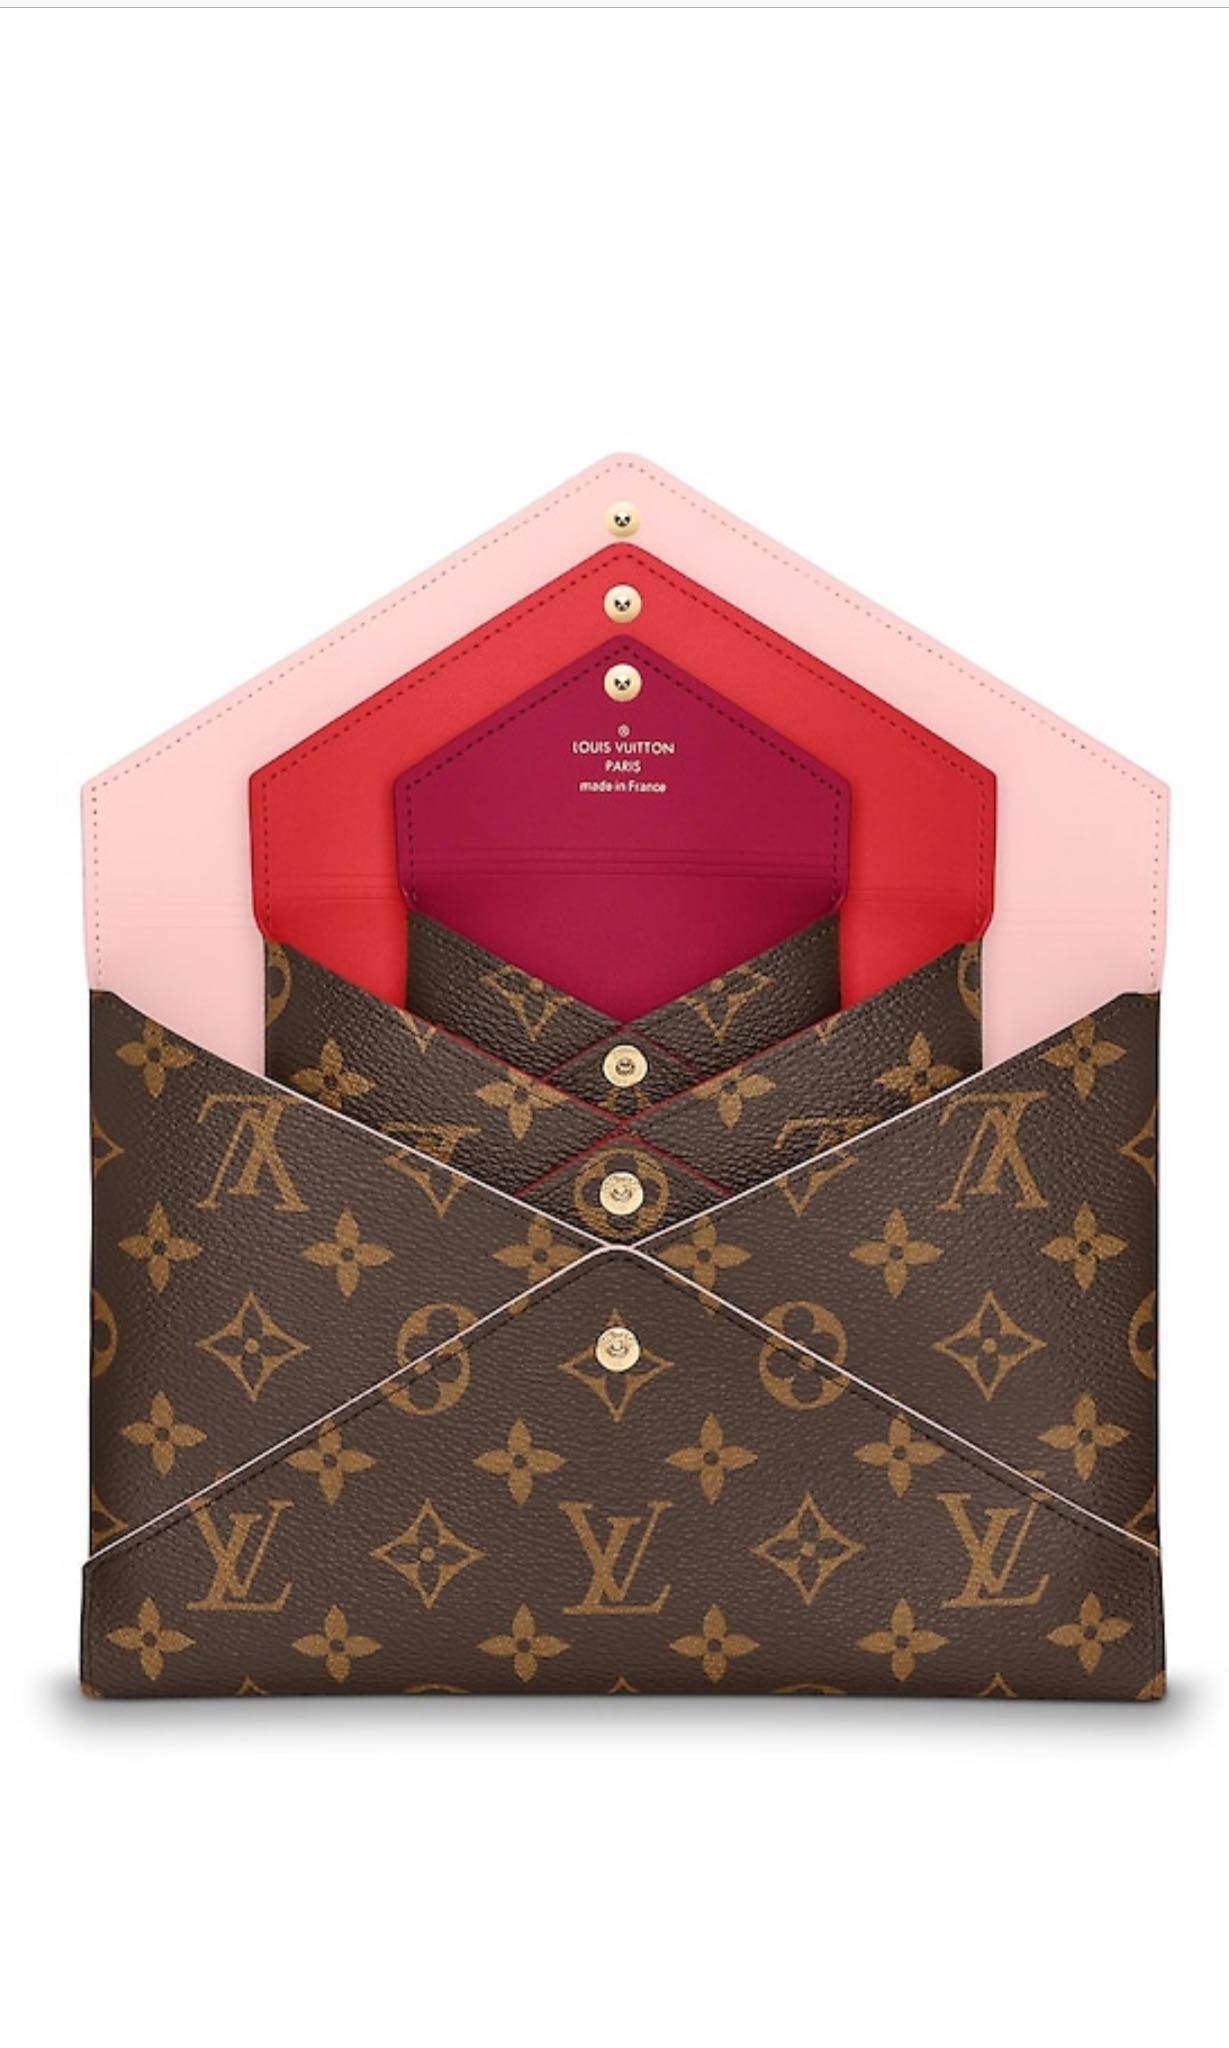 caa460173d38 Louis Vuitton Pochette Kirigami set